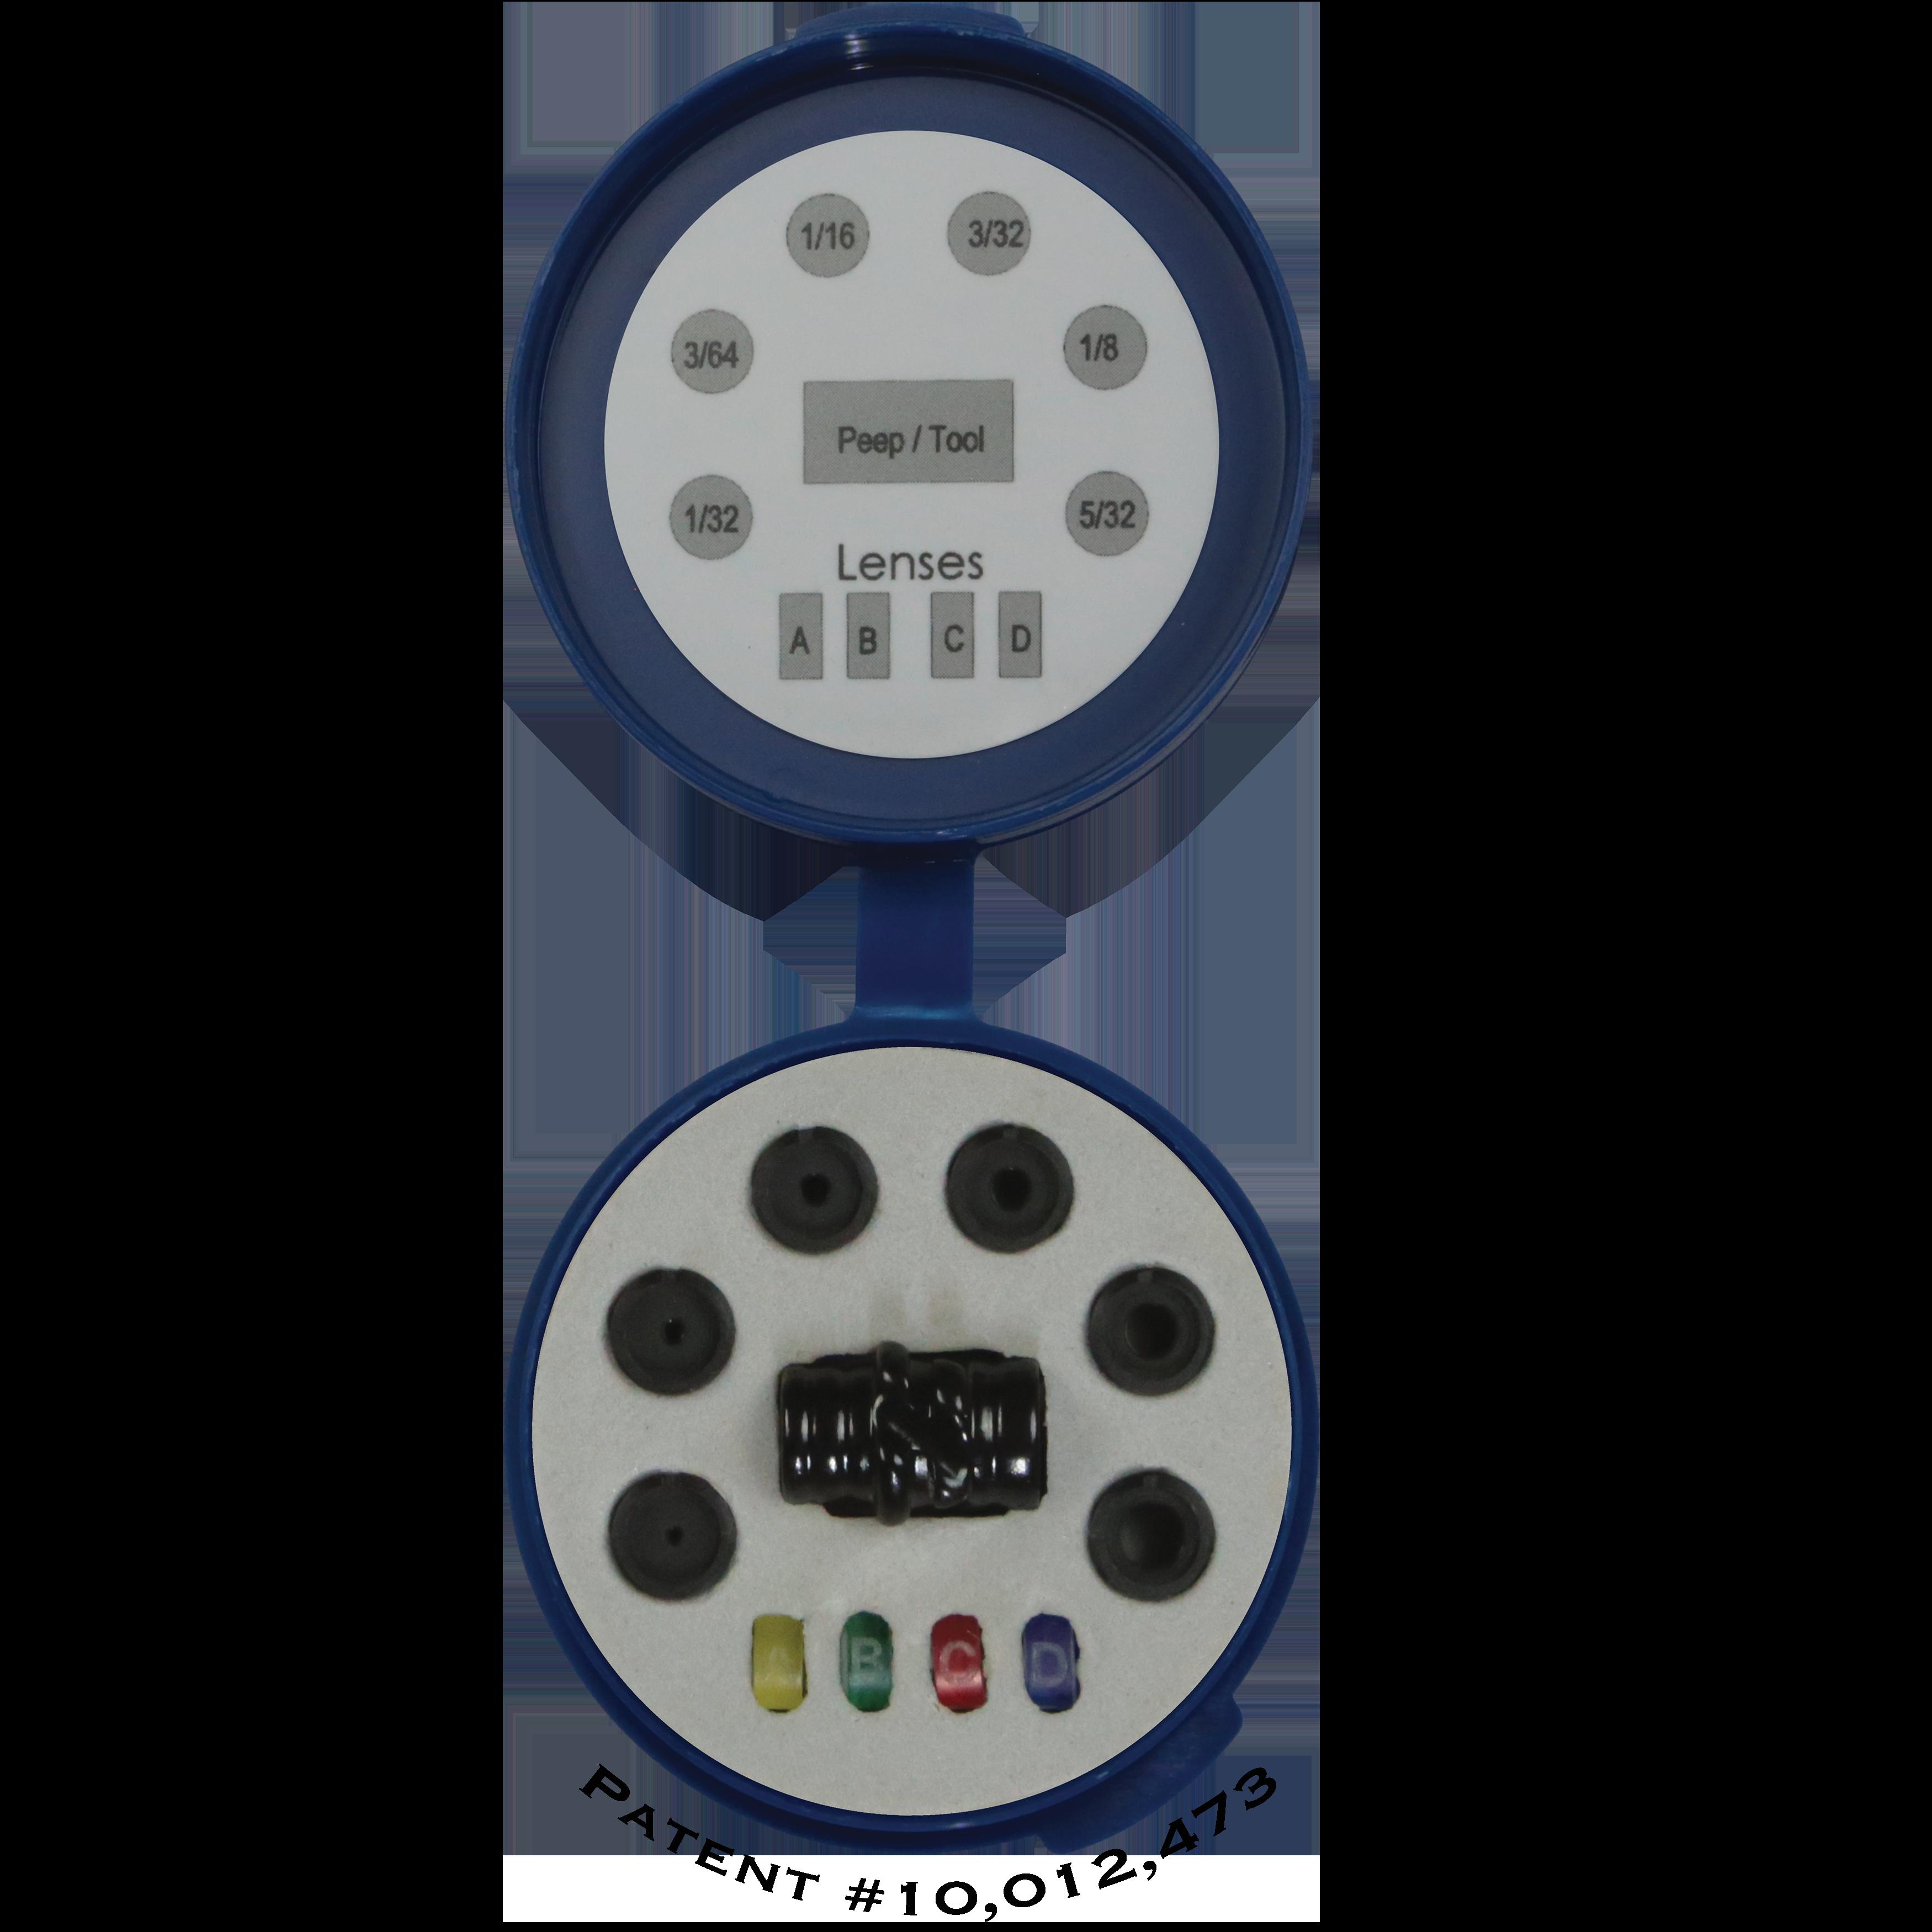 Hamskea Insight Super Deluxe Peep Kit Includes Housing, 6 Apertures//Tool, 4 Len